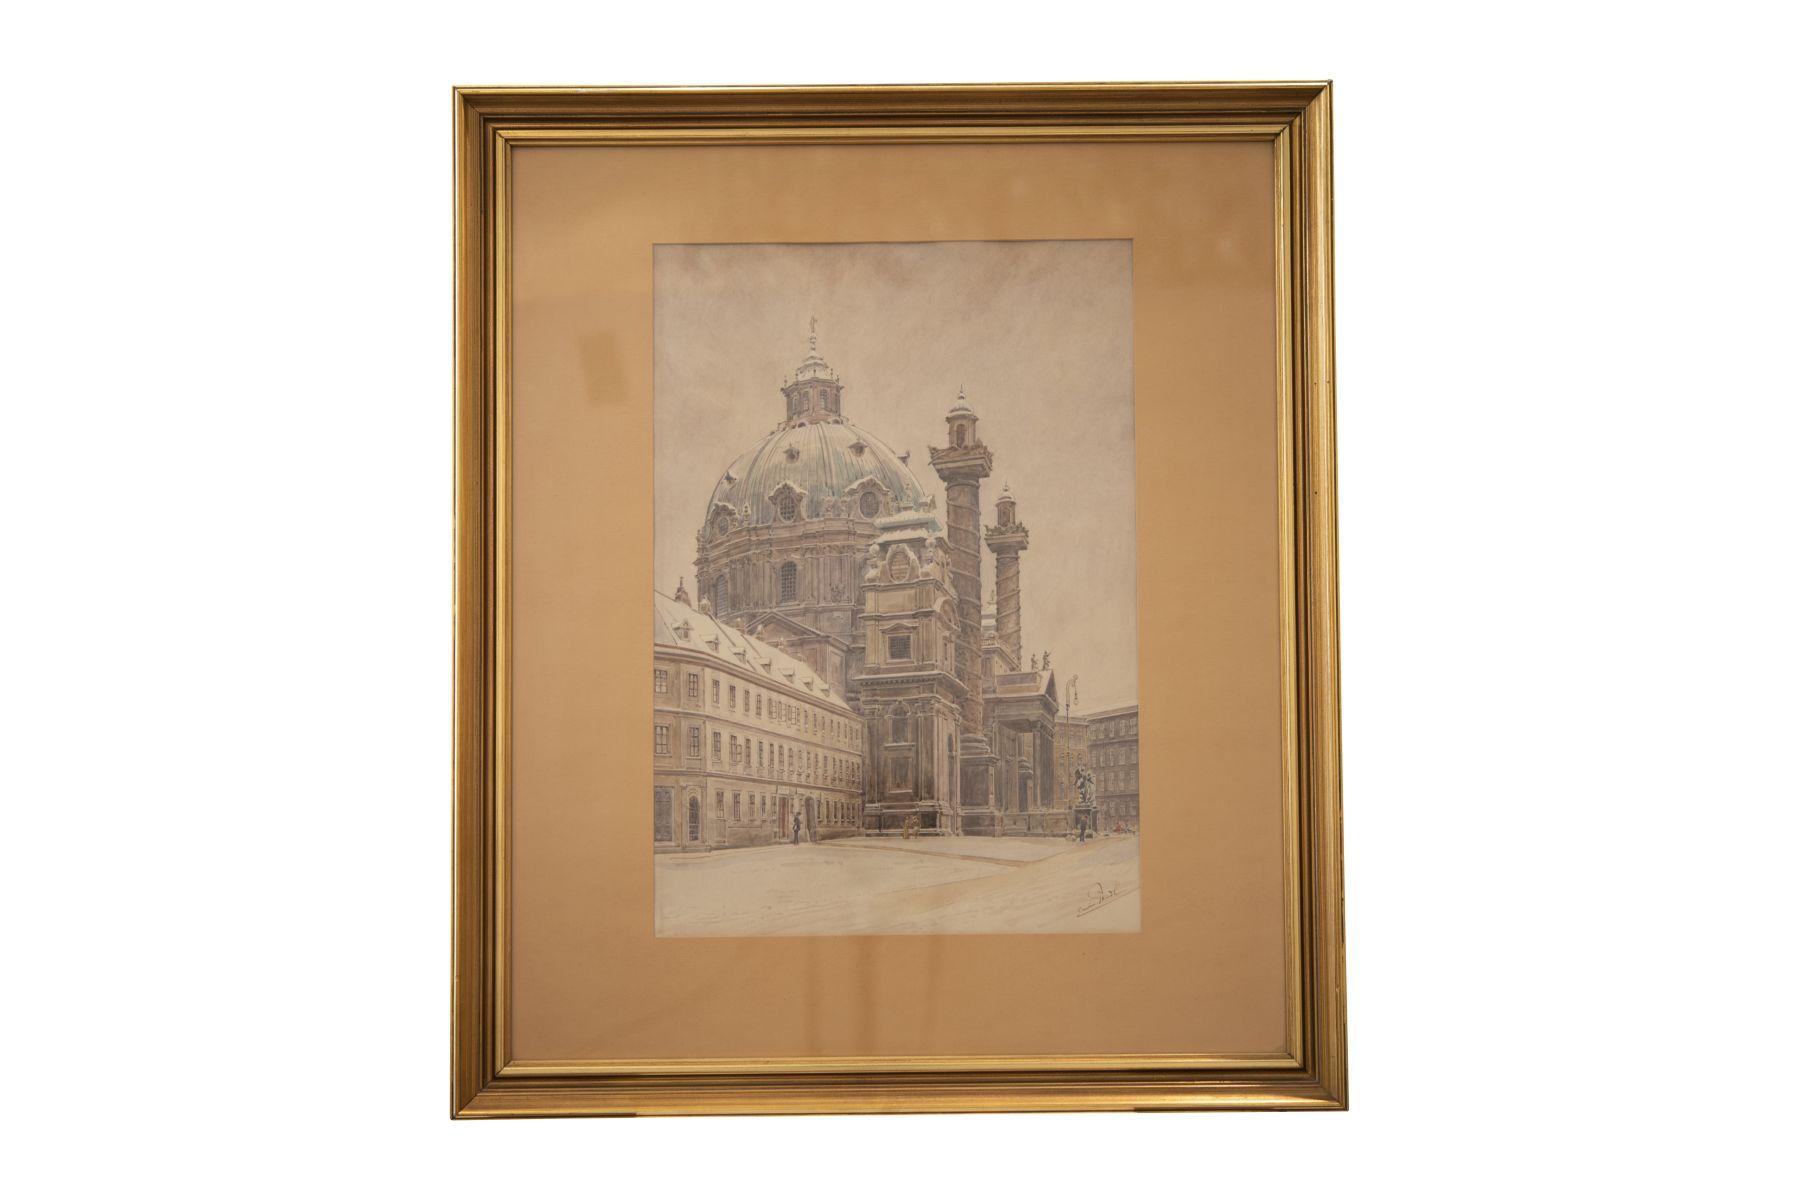 #129 Erwin Pendl (1875–1945), Karlskirche (Church of St. Charles), Vienna | Erwin Pendl (1875–1945), Karlskirche, Wien, Anfang 20. Jh. Image